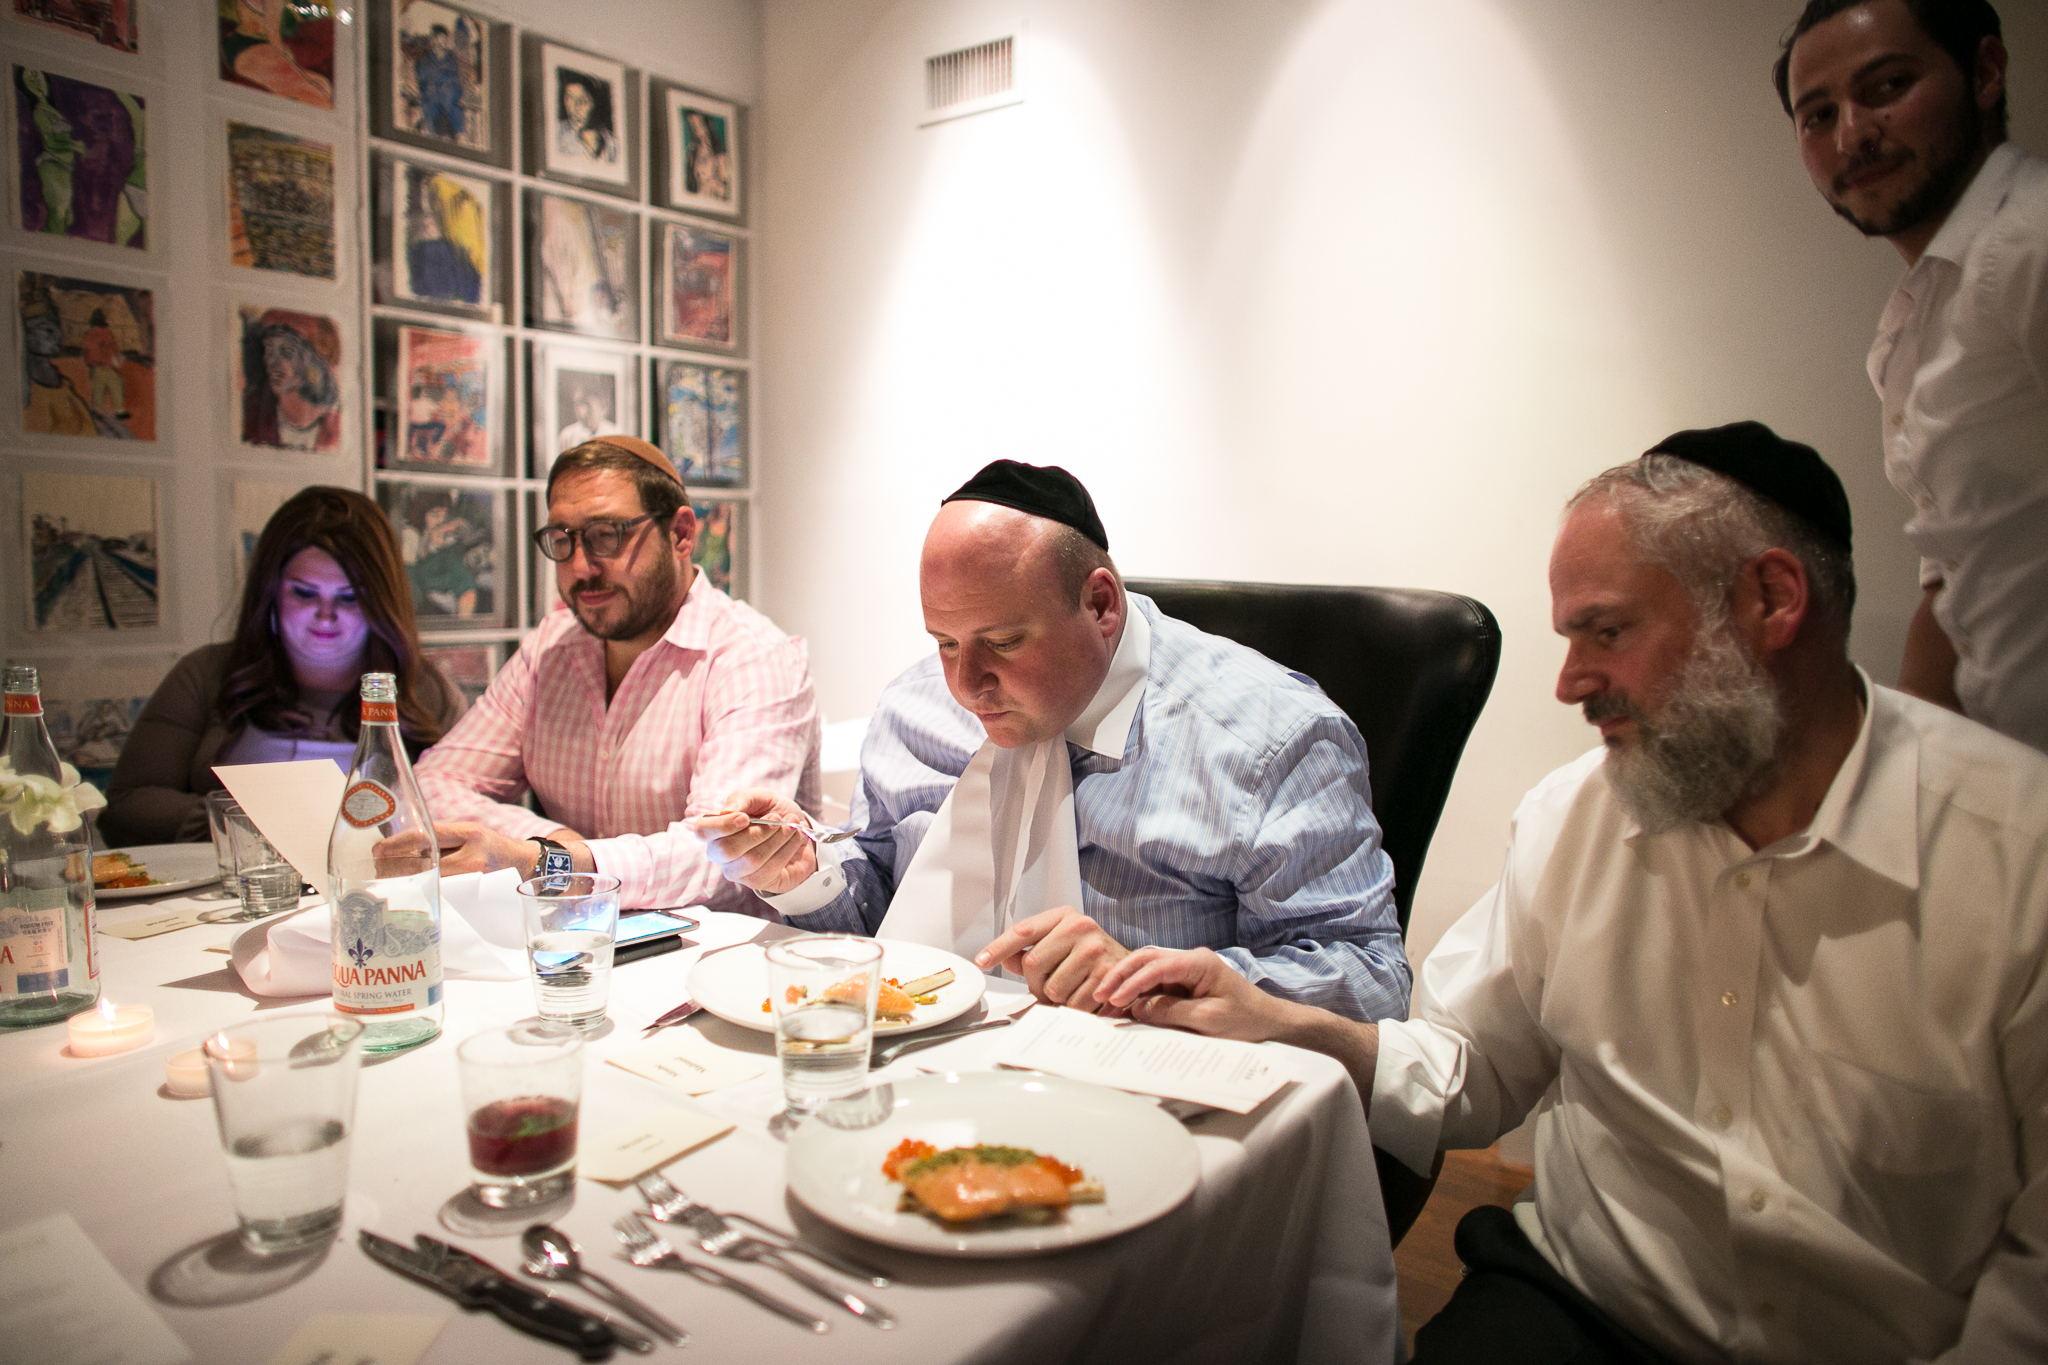 Kosher _ Supper _ Kitchensurfing-142.jpg